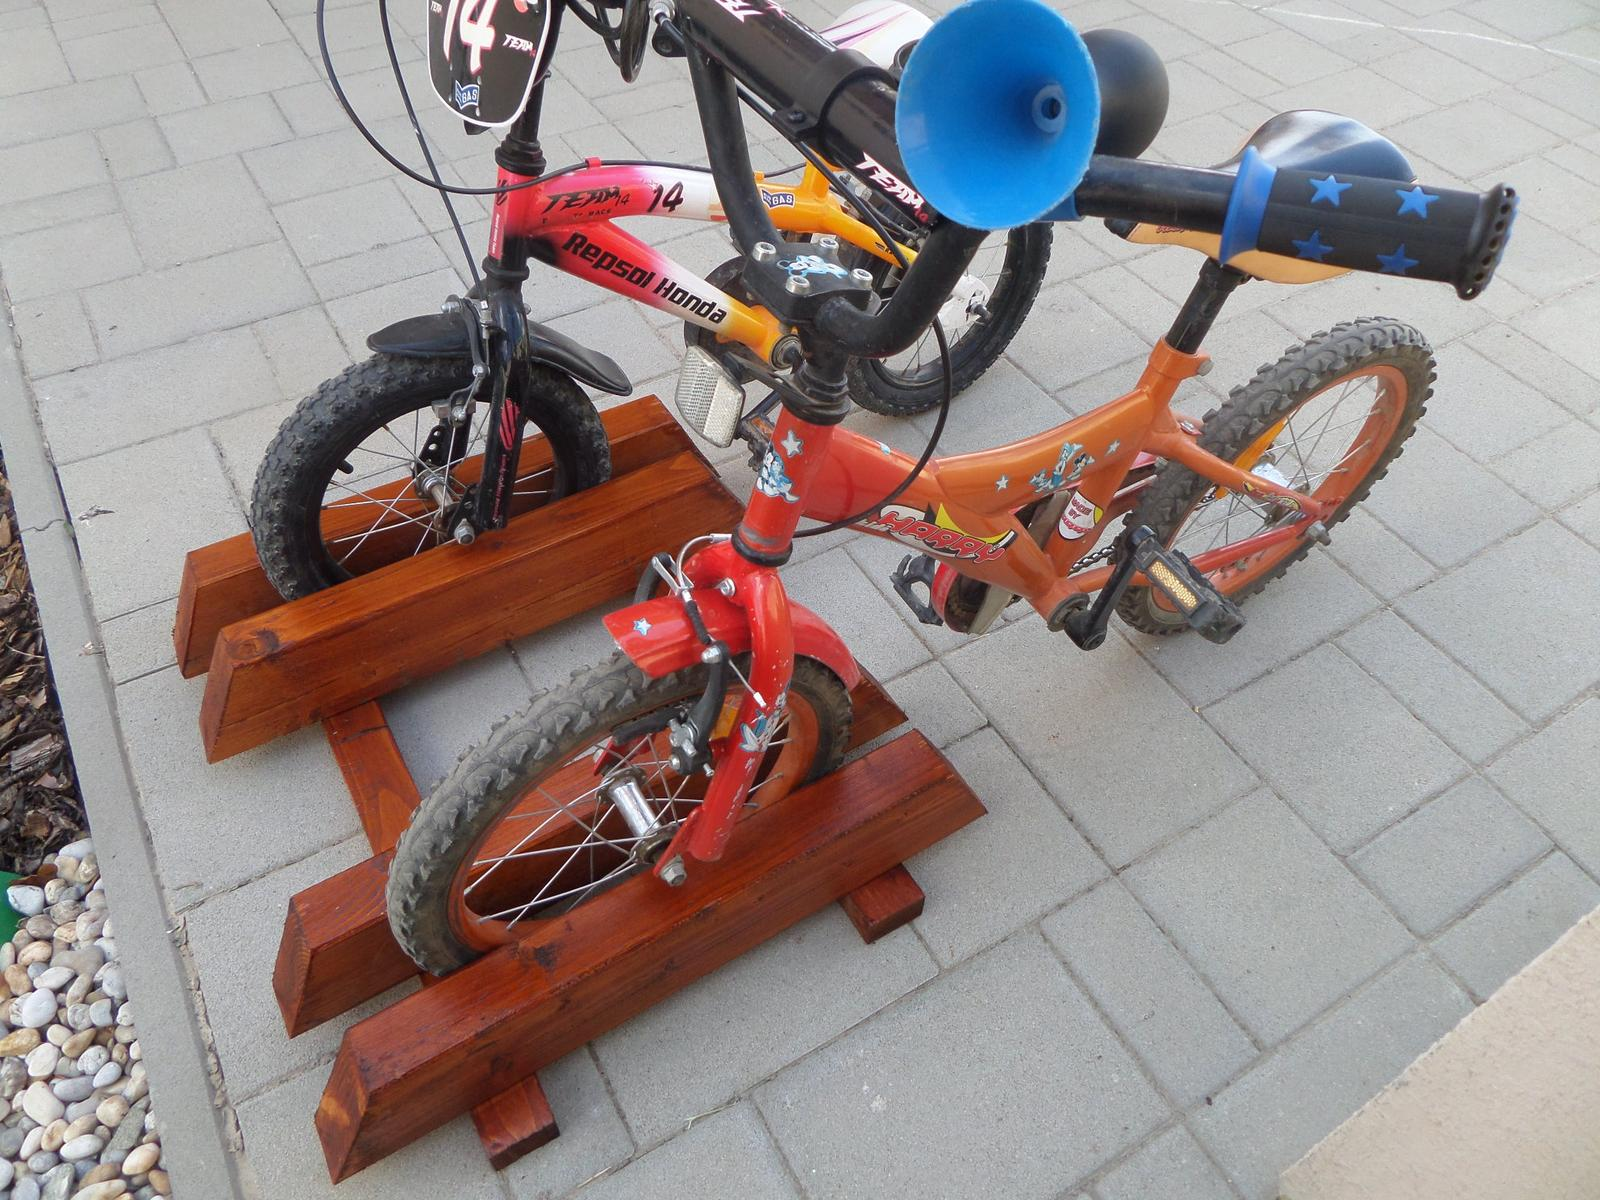 Záhrada a okolie - Vyrobeny stojan na bicykle :)